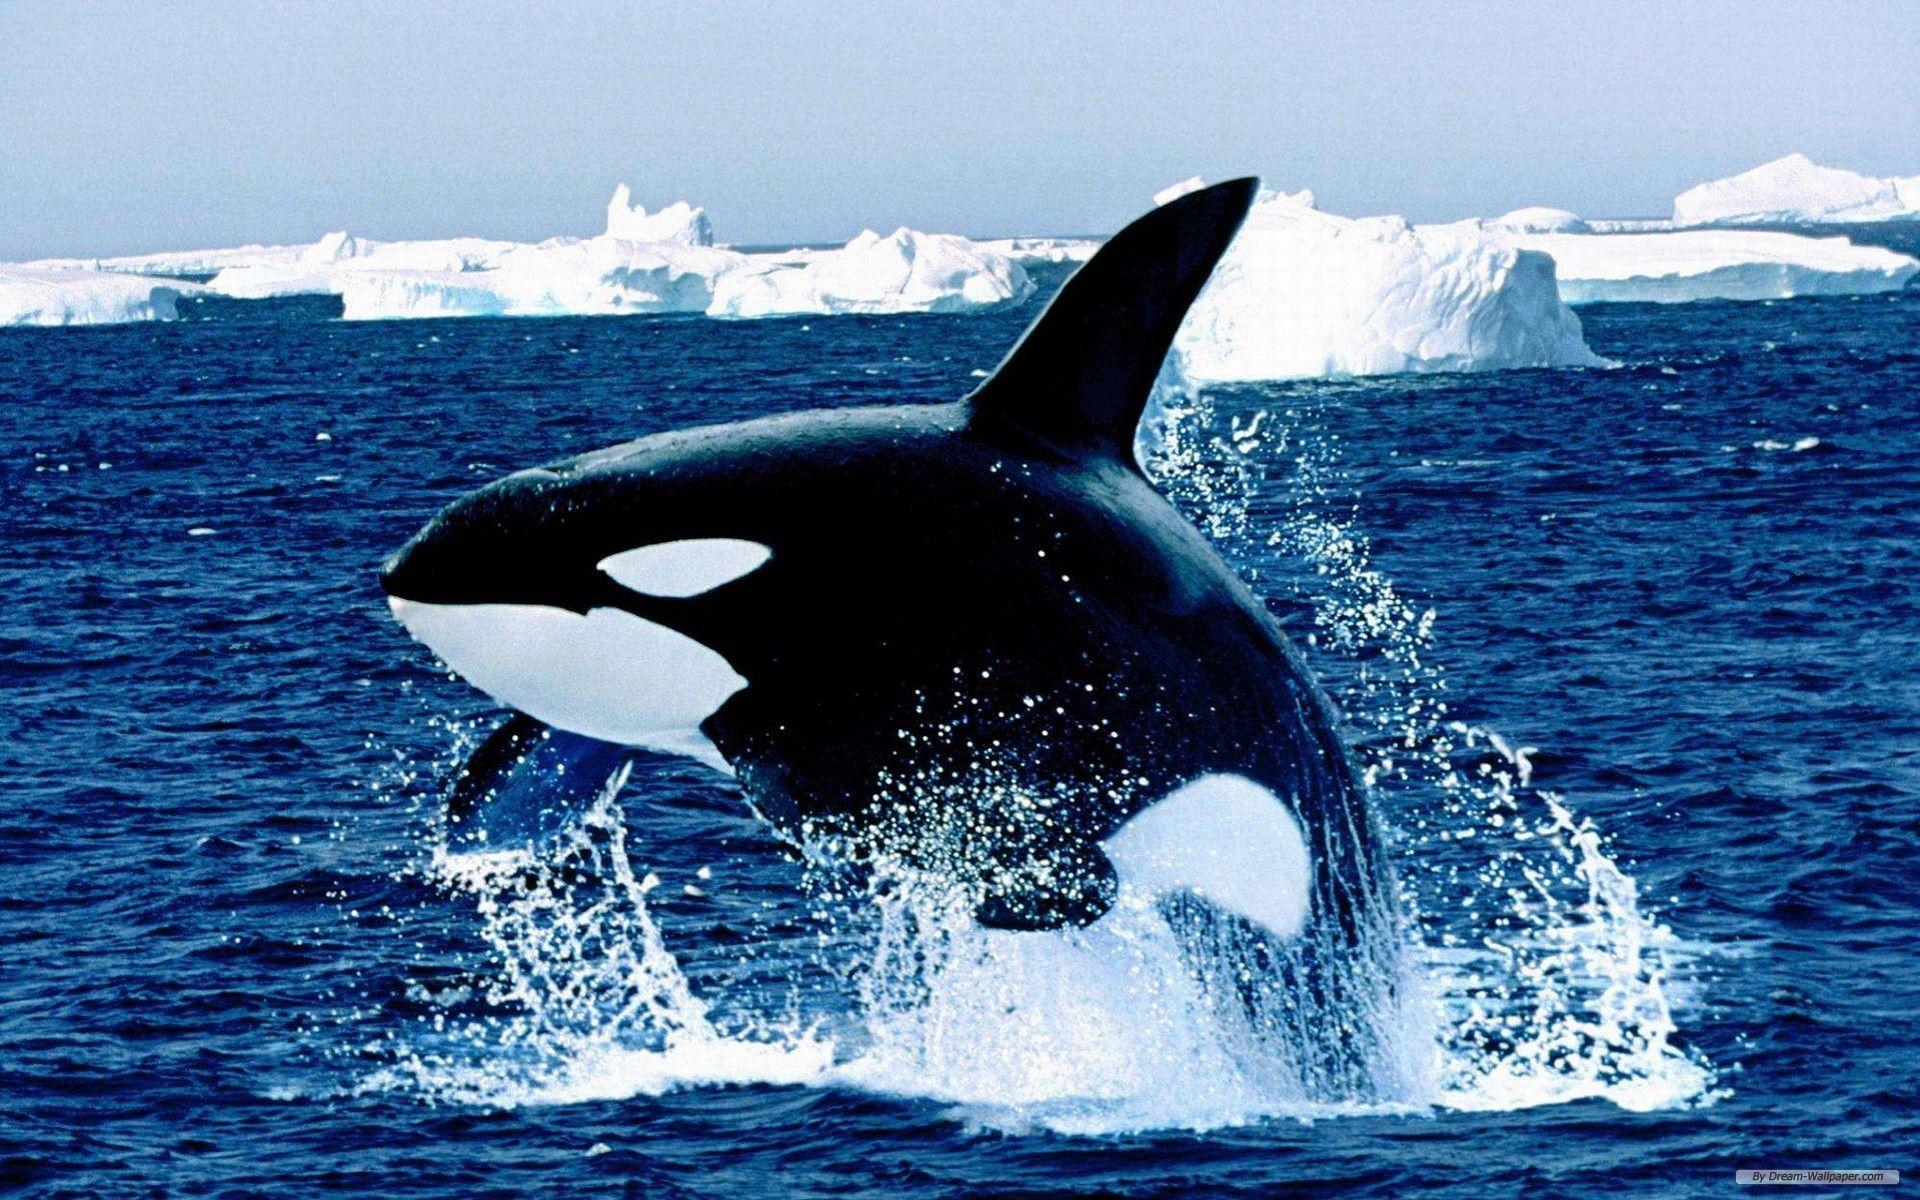 Free Wallpaper - Free Animal wallpaper - Marine life 1 wallpaper ...